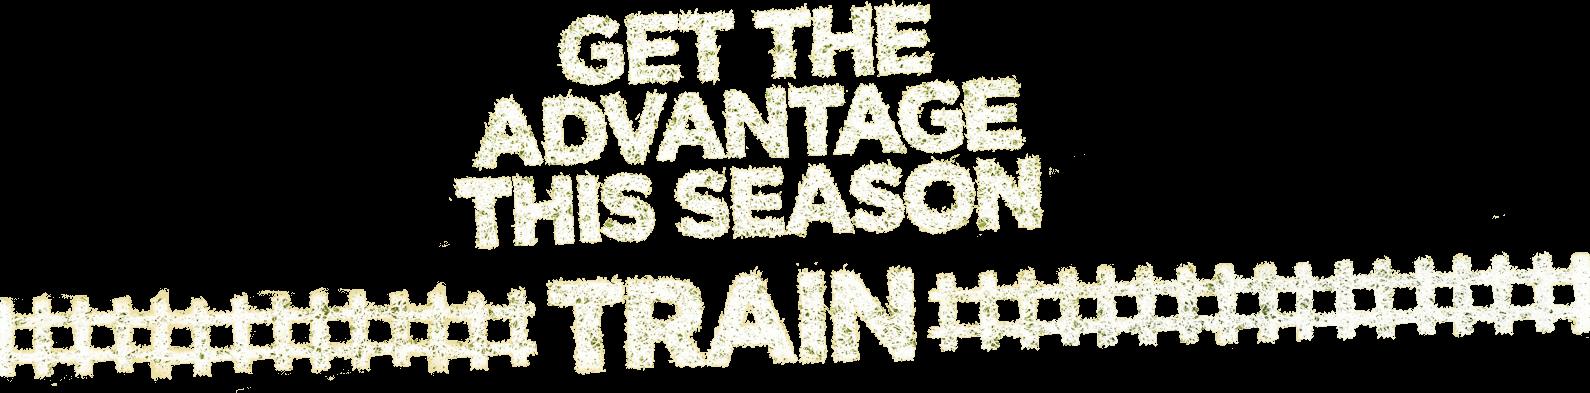 Get The Advantage This Season - Train